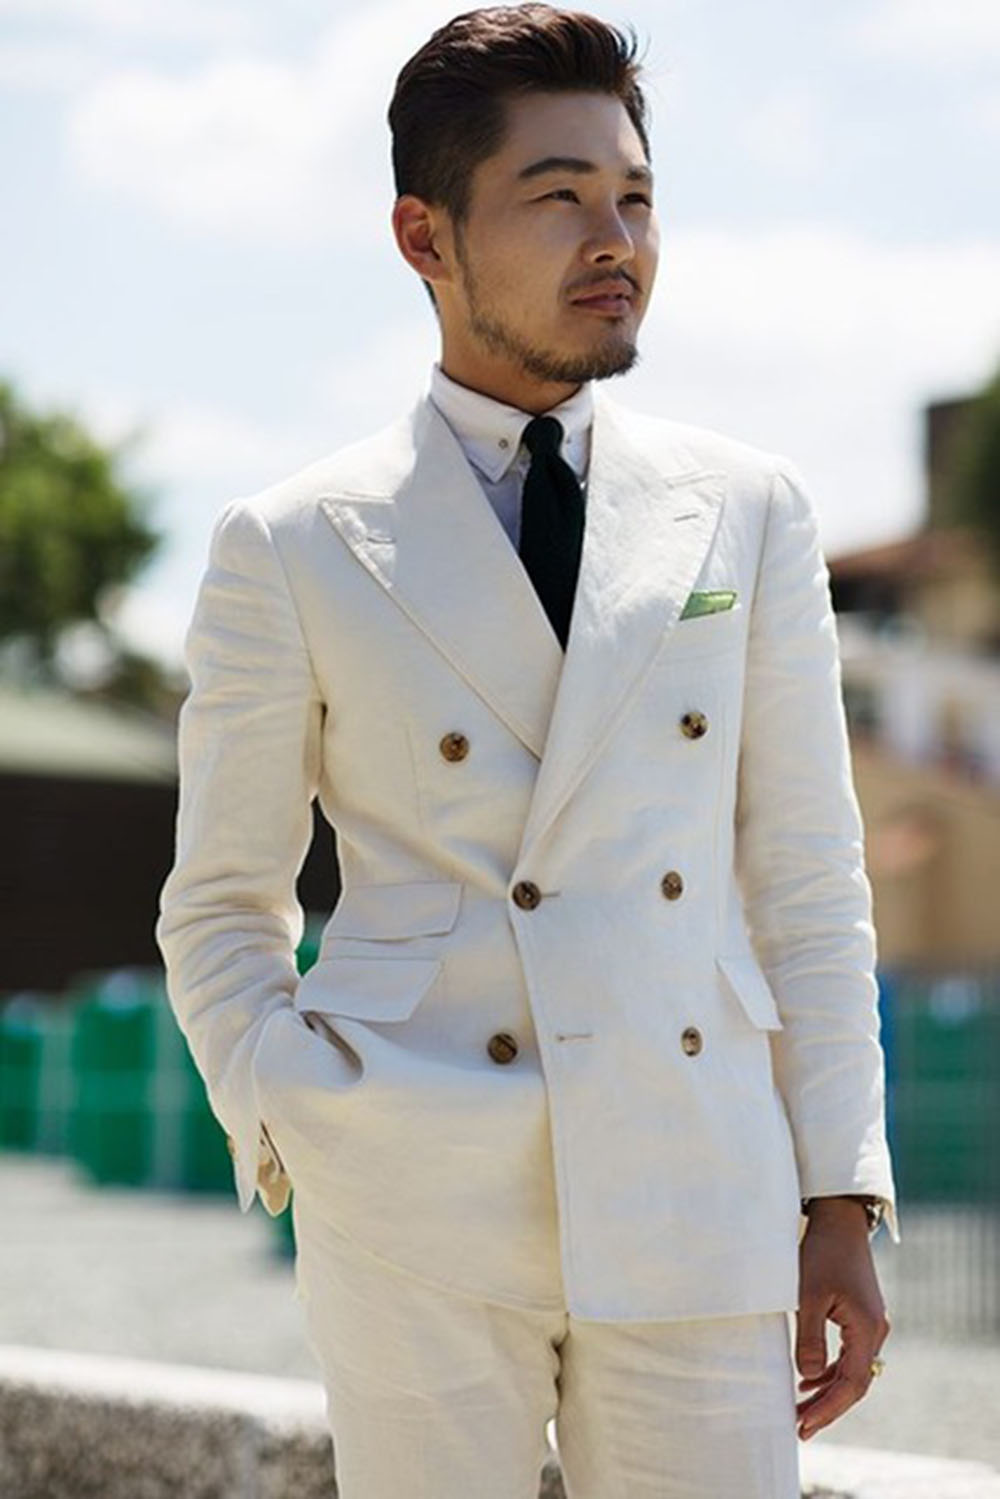 ( Blazer+Pant)Custom Slim Fit Ivory Grey Double Breasted Solid 2-Piece Suit Notch Lapel Groomsman Tuxedo Jacket Pants Set 2 Pcs